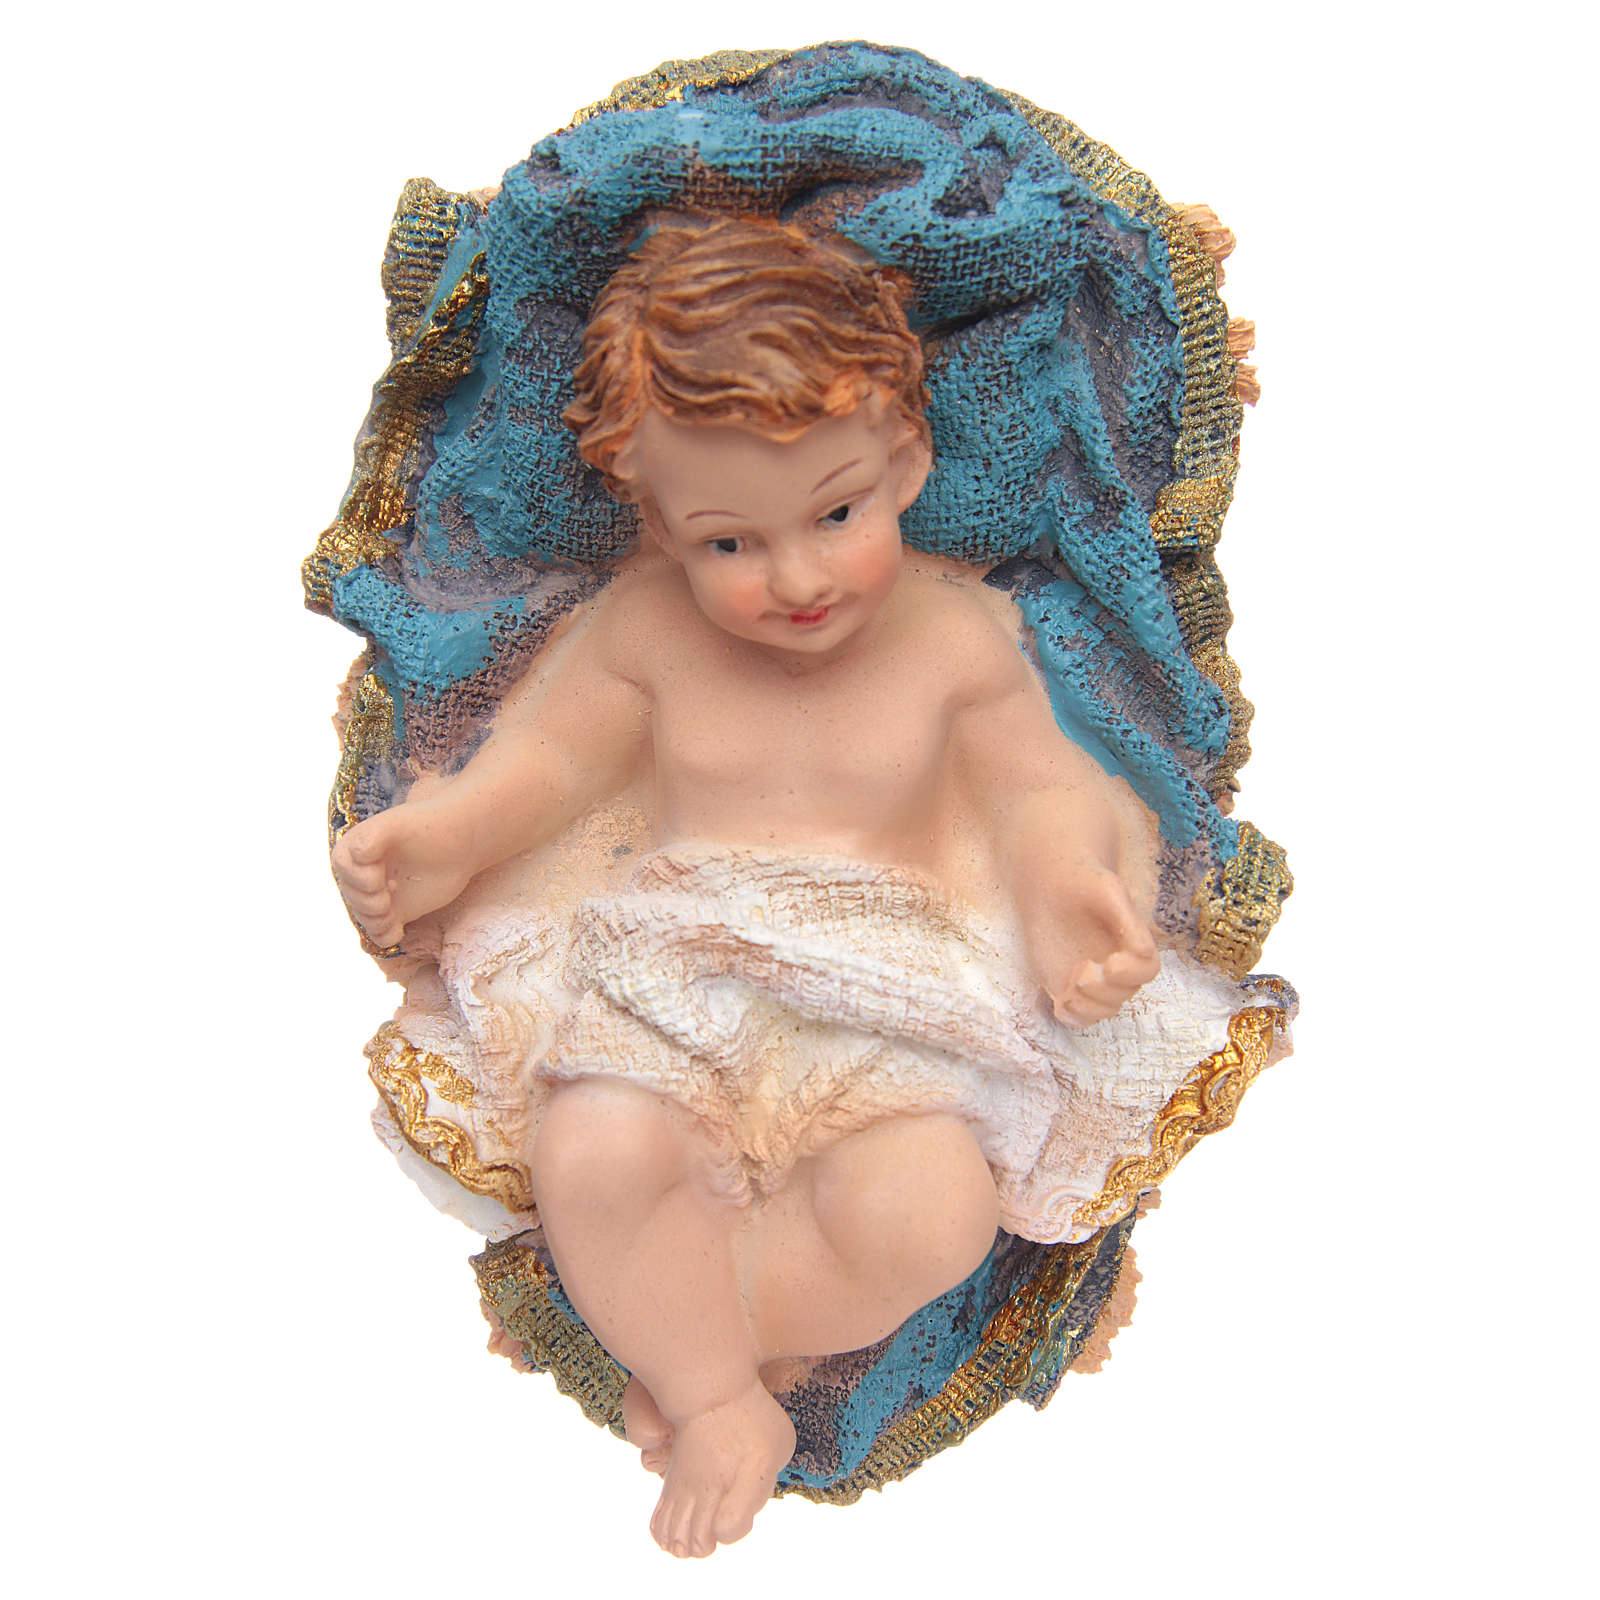 Baby Jesus in cradle, resin 15cm  3